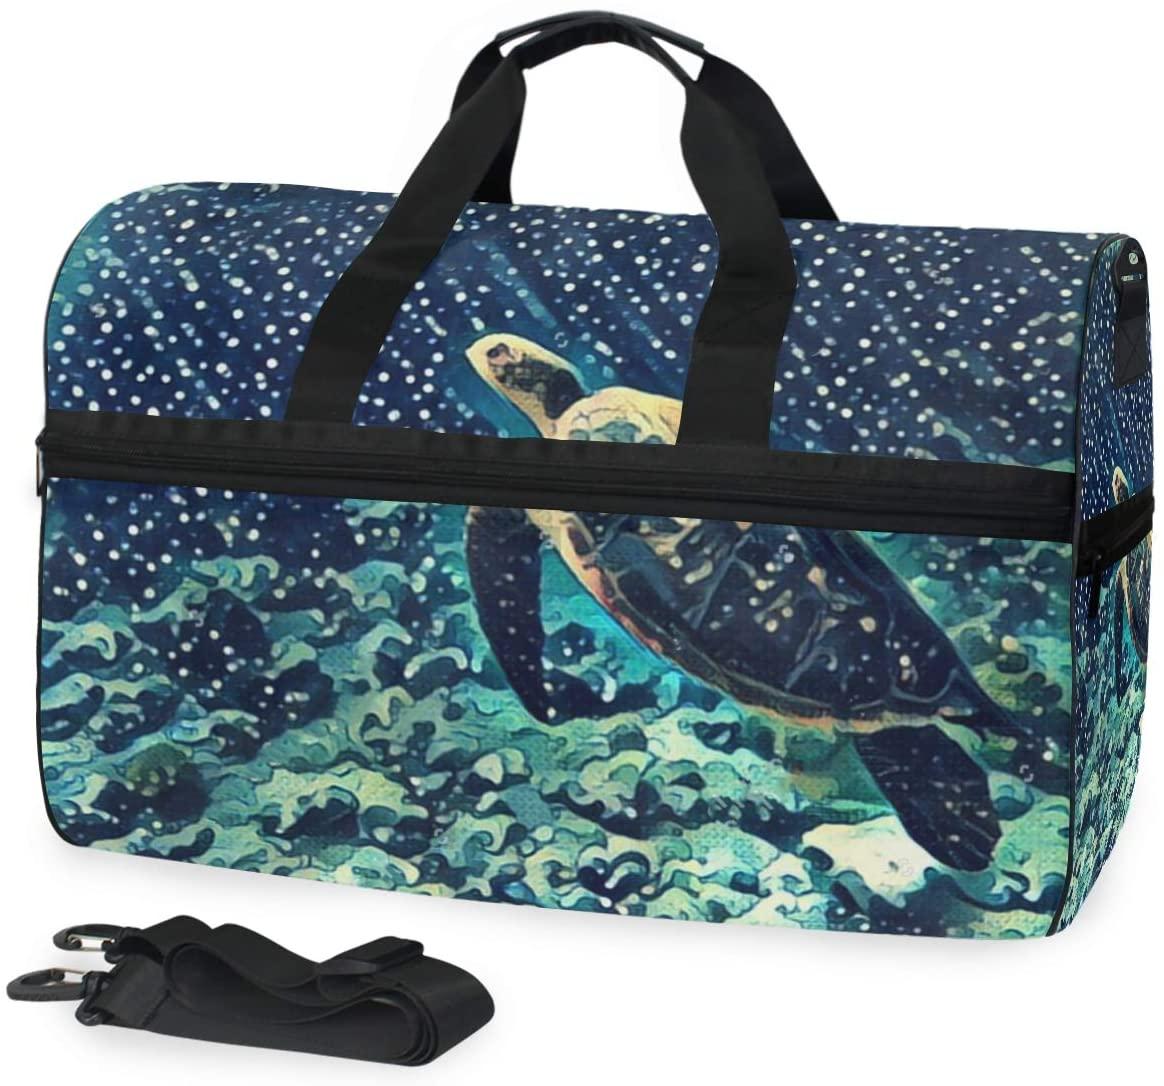 SLHFPX Gym Bag Sea Turtle Coral Sport Duffle Holdall Bag Training Handbag Yoga Bag for Men Women